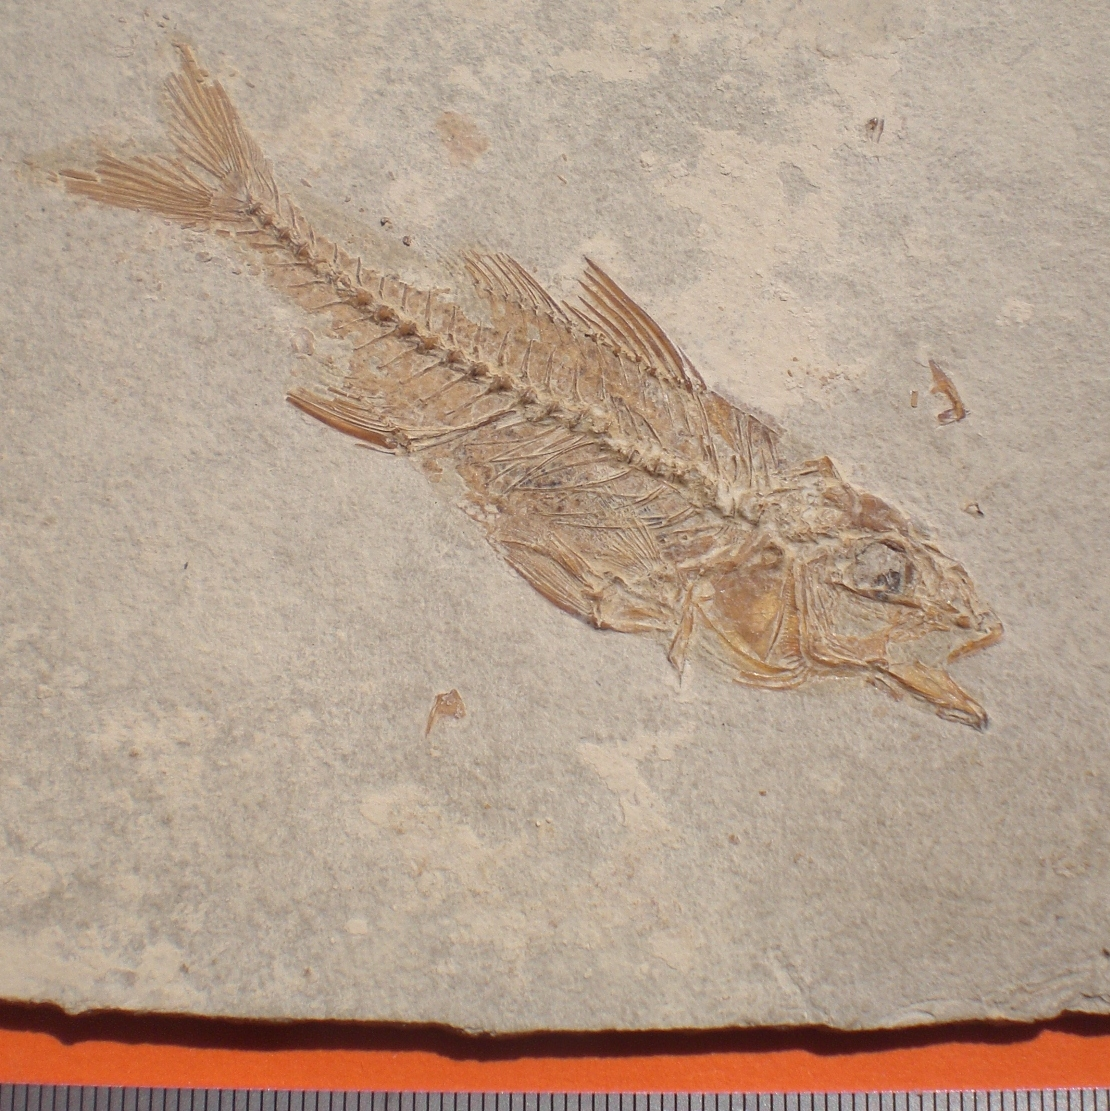 Dapalis Macrurus Oligocene Aix en Provence France